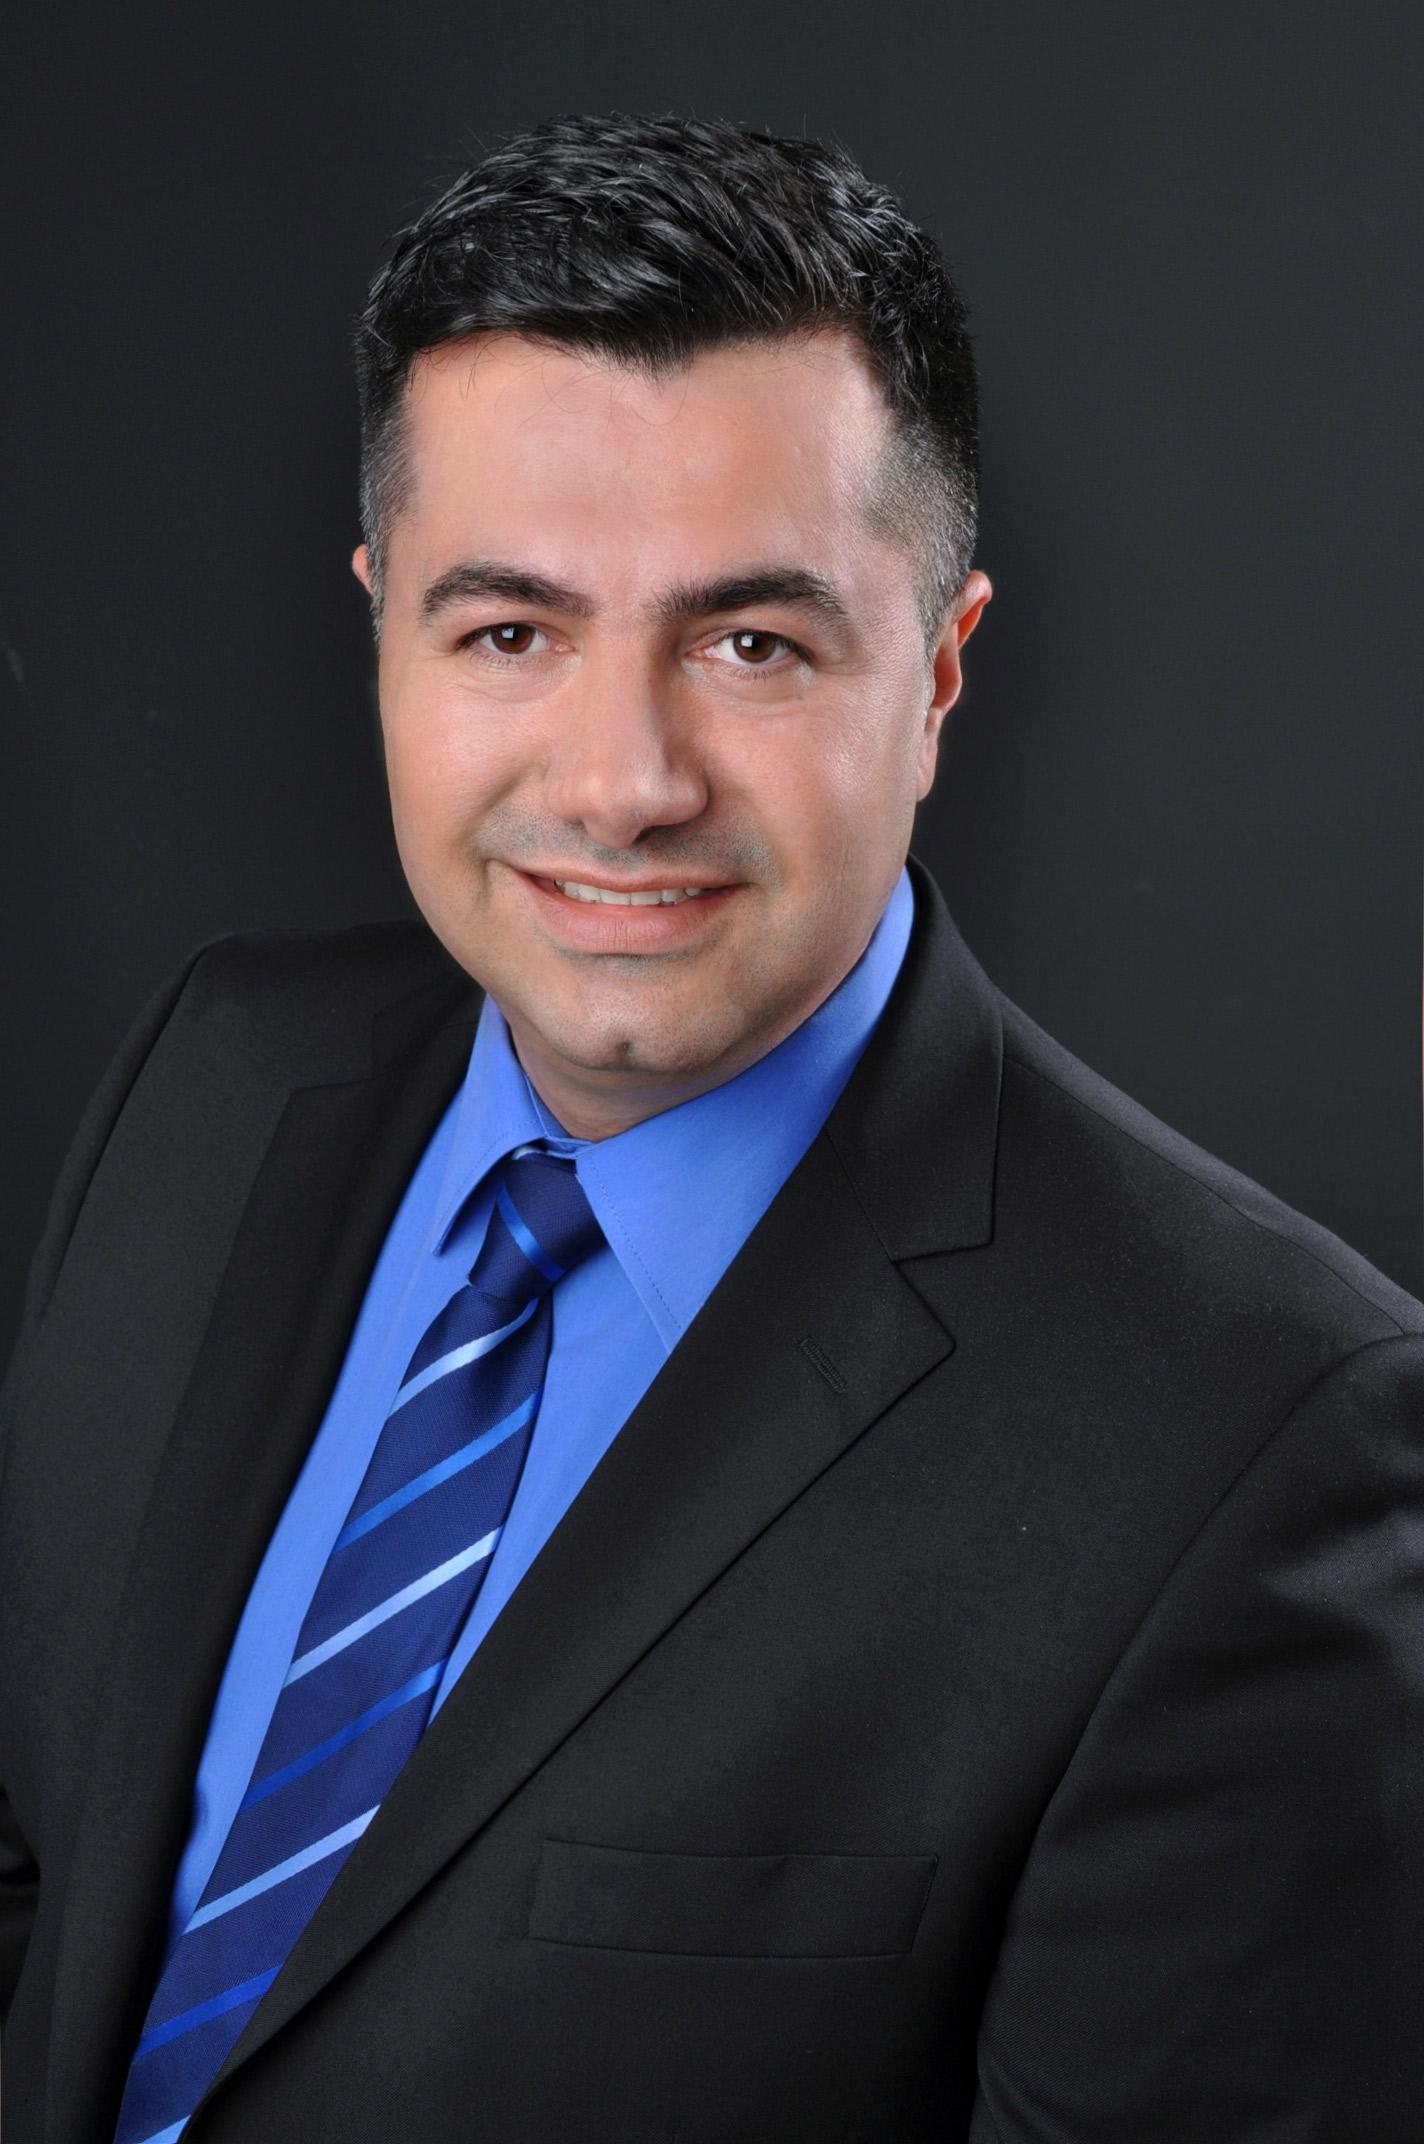 Kambiz Angourani Geschäftsführer ASG SECURA GmbH